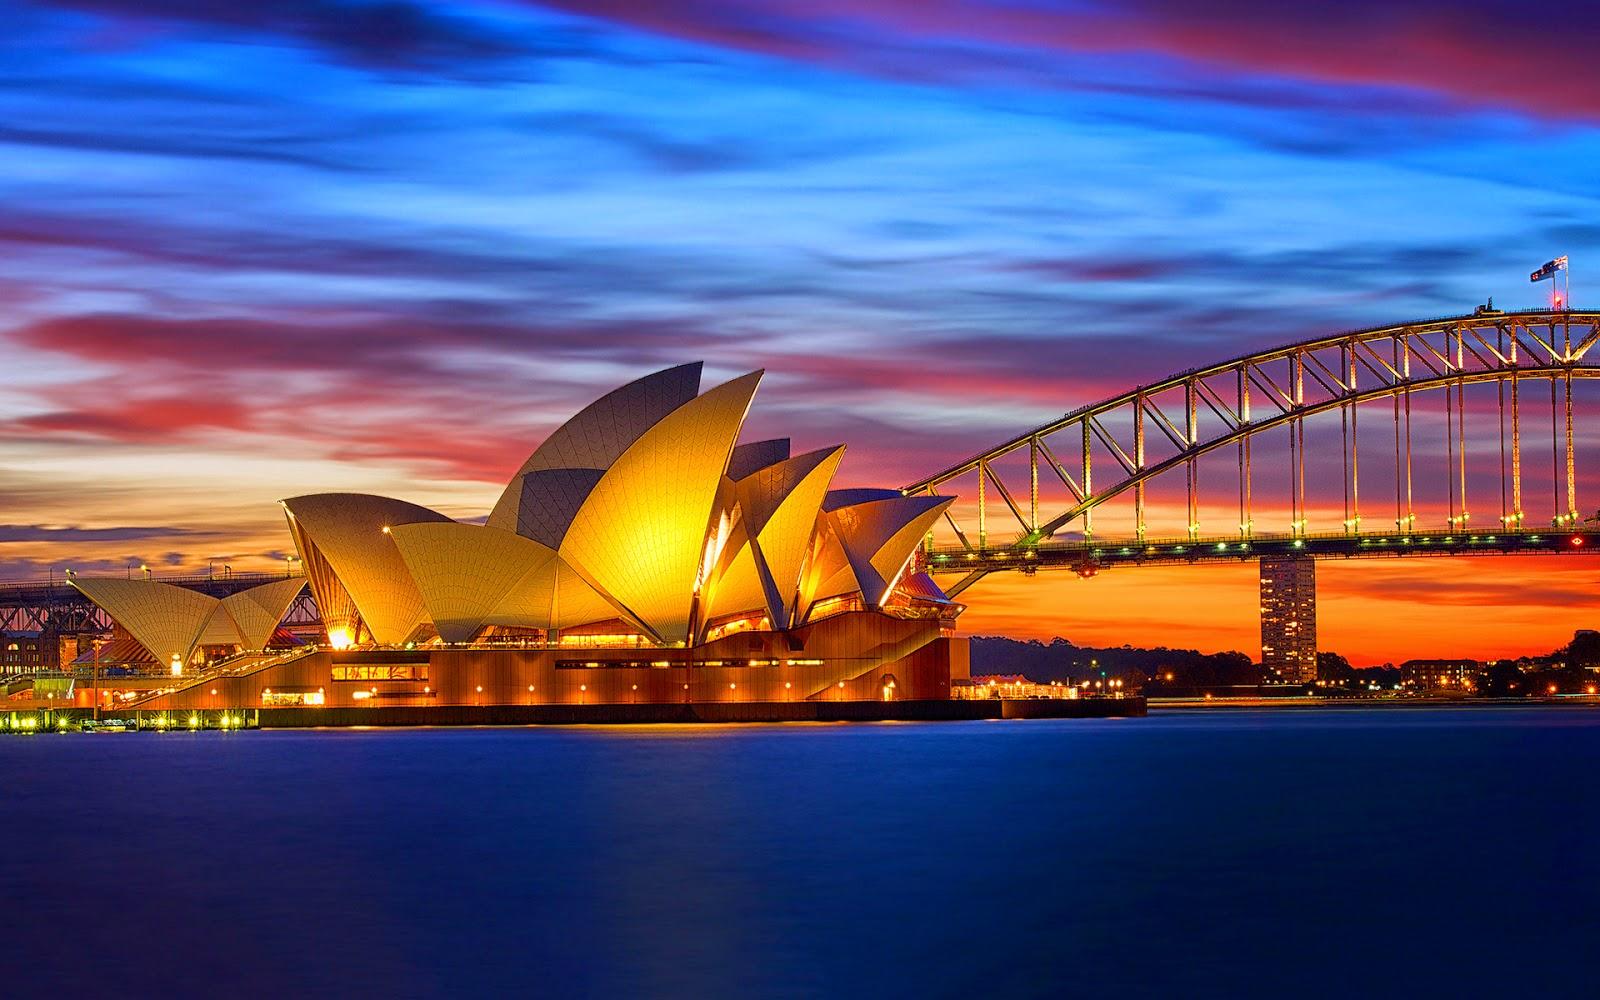 http://2.bp.blogspot.com/-tmN_AH_VsKA/U_XViDOdVGI/AAAAAAAABzI/1R2HY685o2k/s1600/study-in-australia.jpg